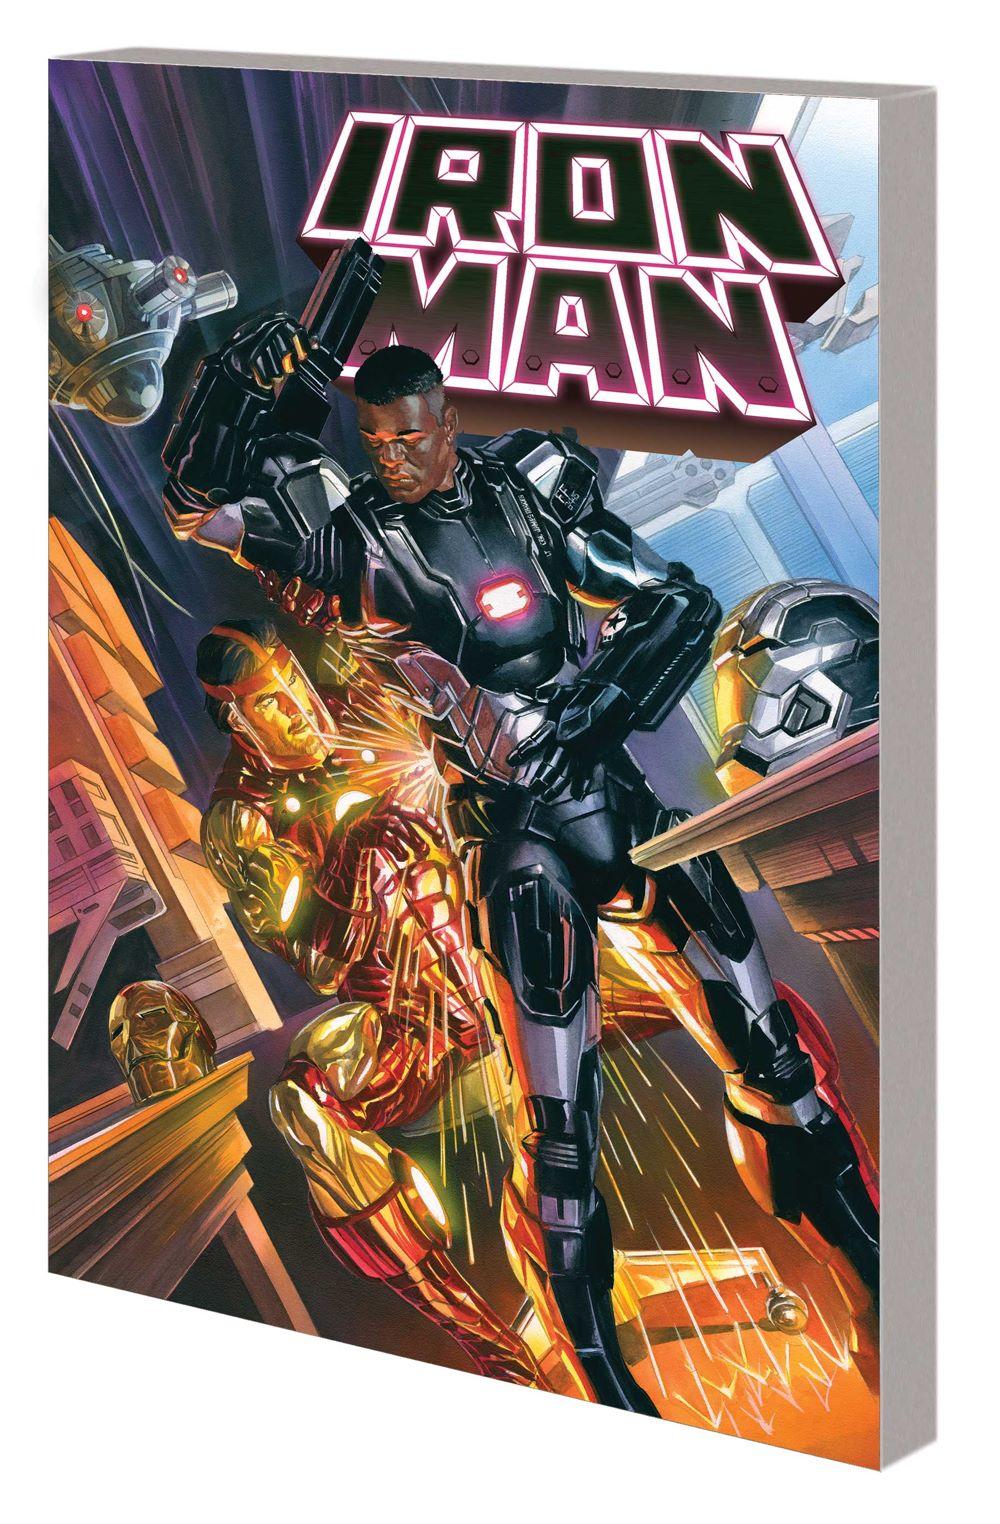 IRON_MAN_VOL_2_TPB Marvel Comics August 2021 Solicitations